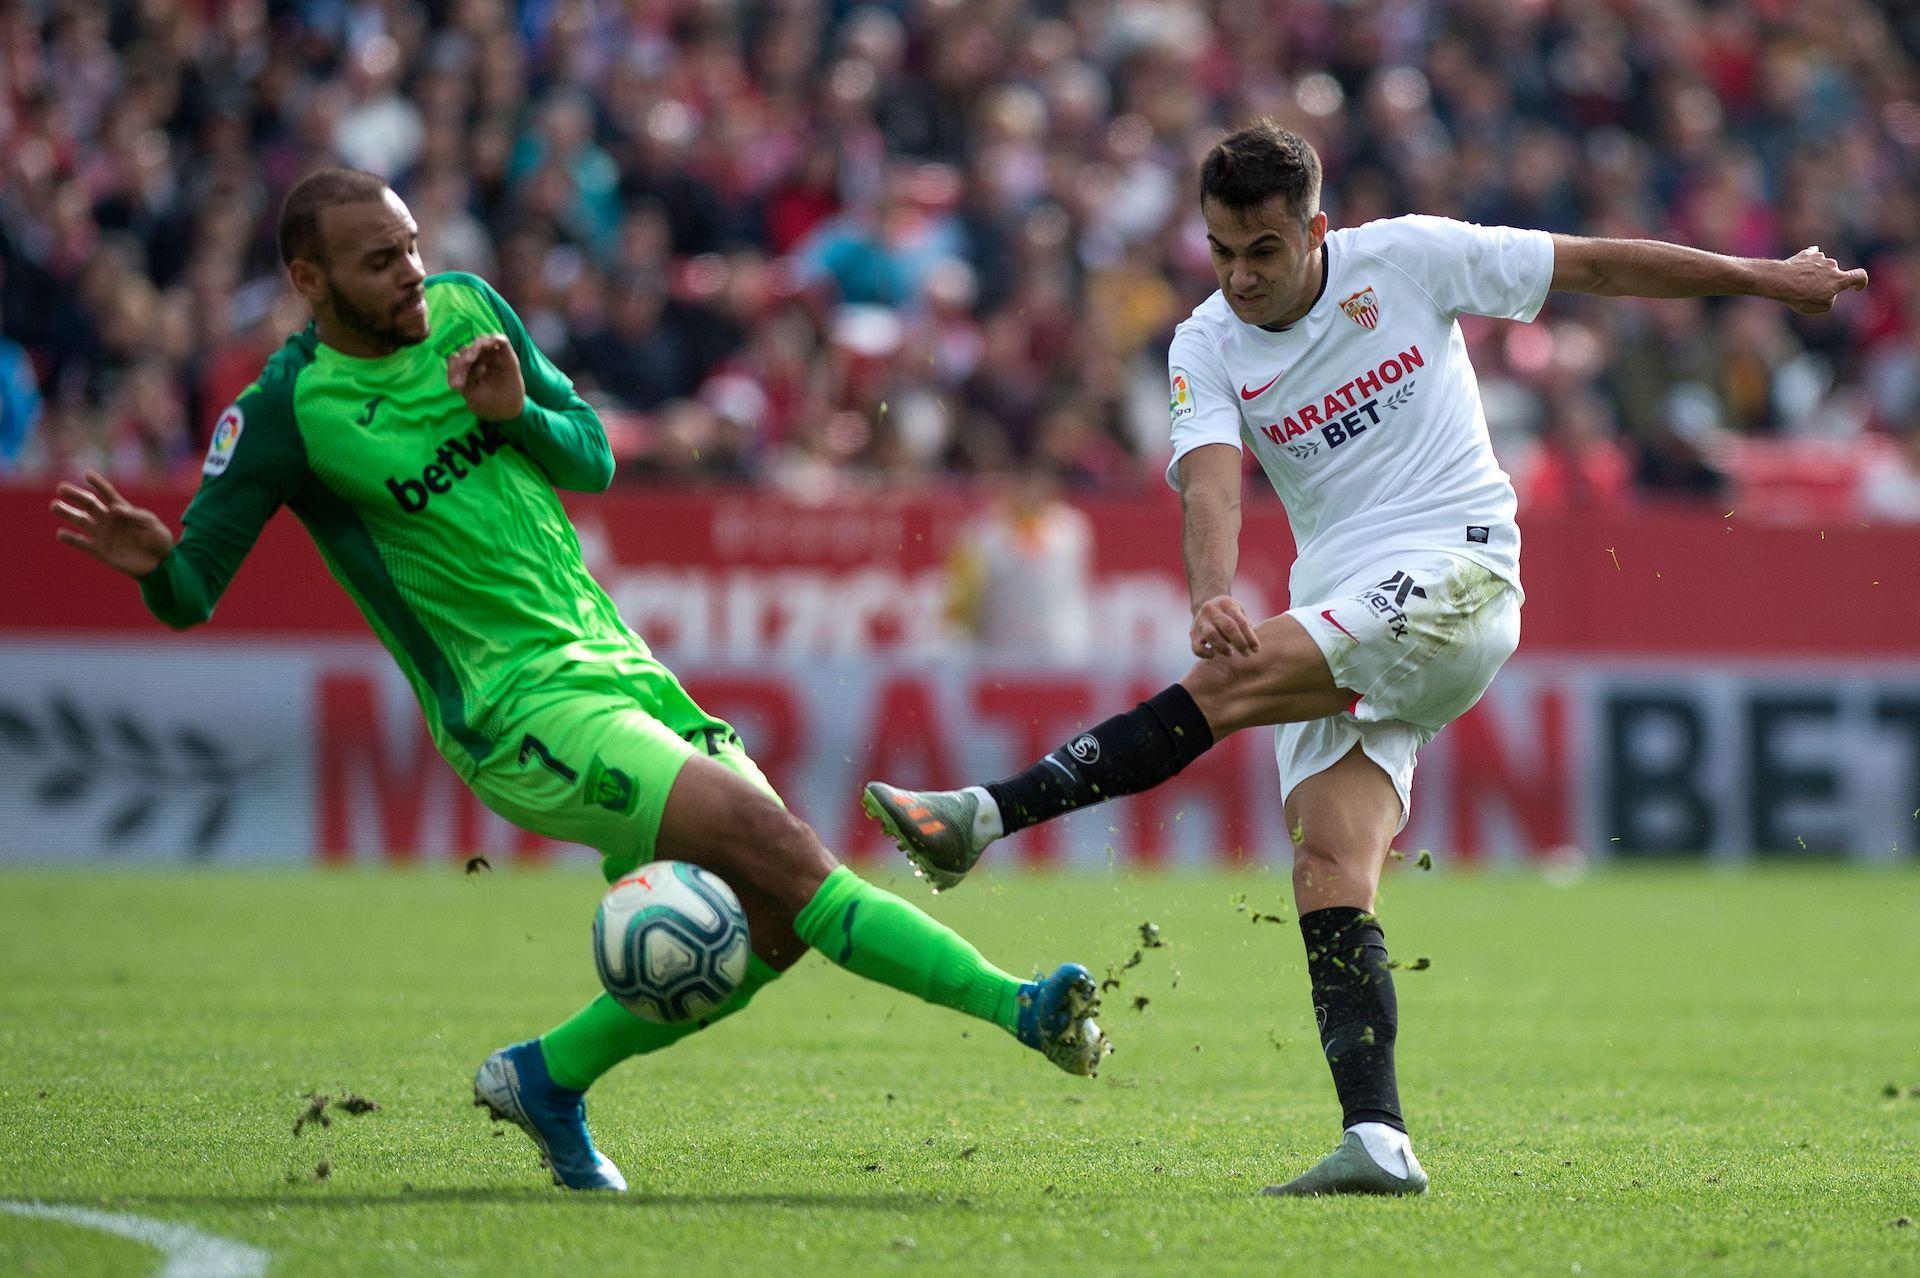 El resumen del Sevilla vs. Leganés, de La Liga: vídeos, goles y  estadísticas | Goal.com